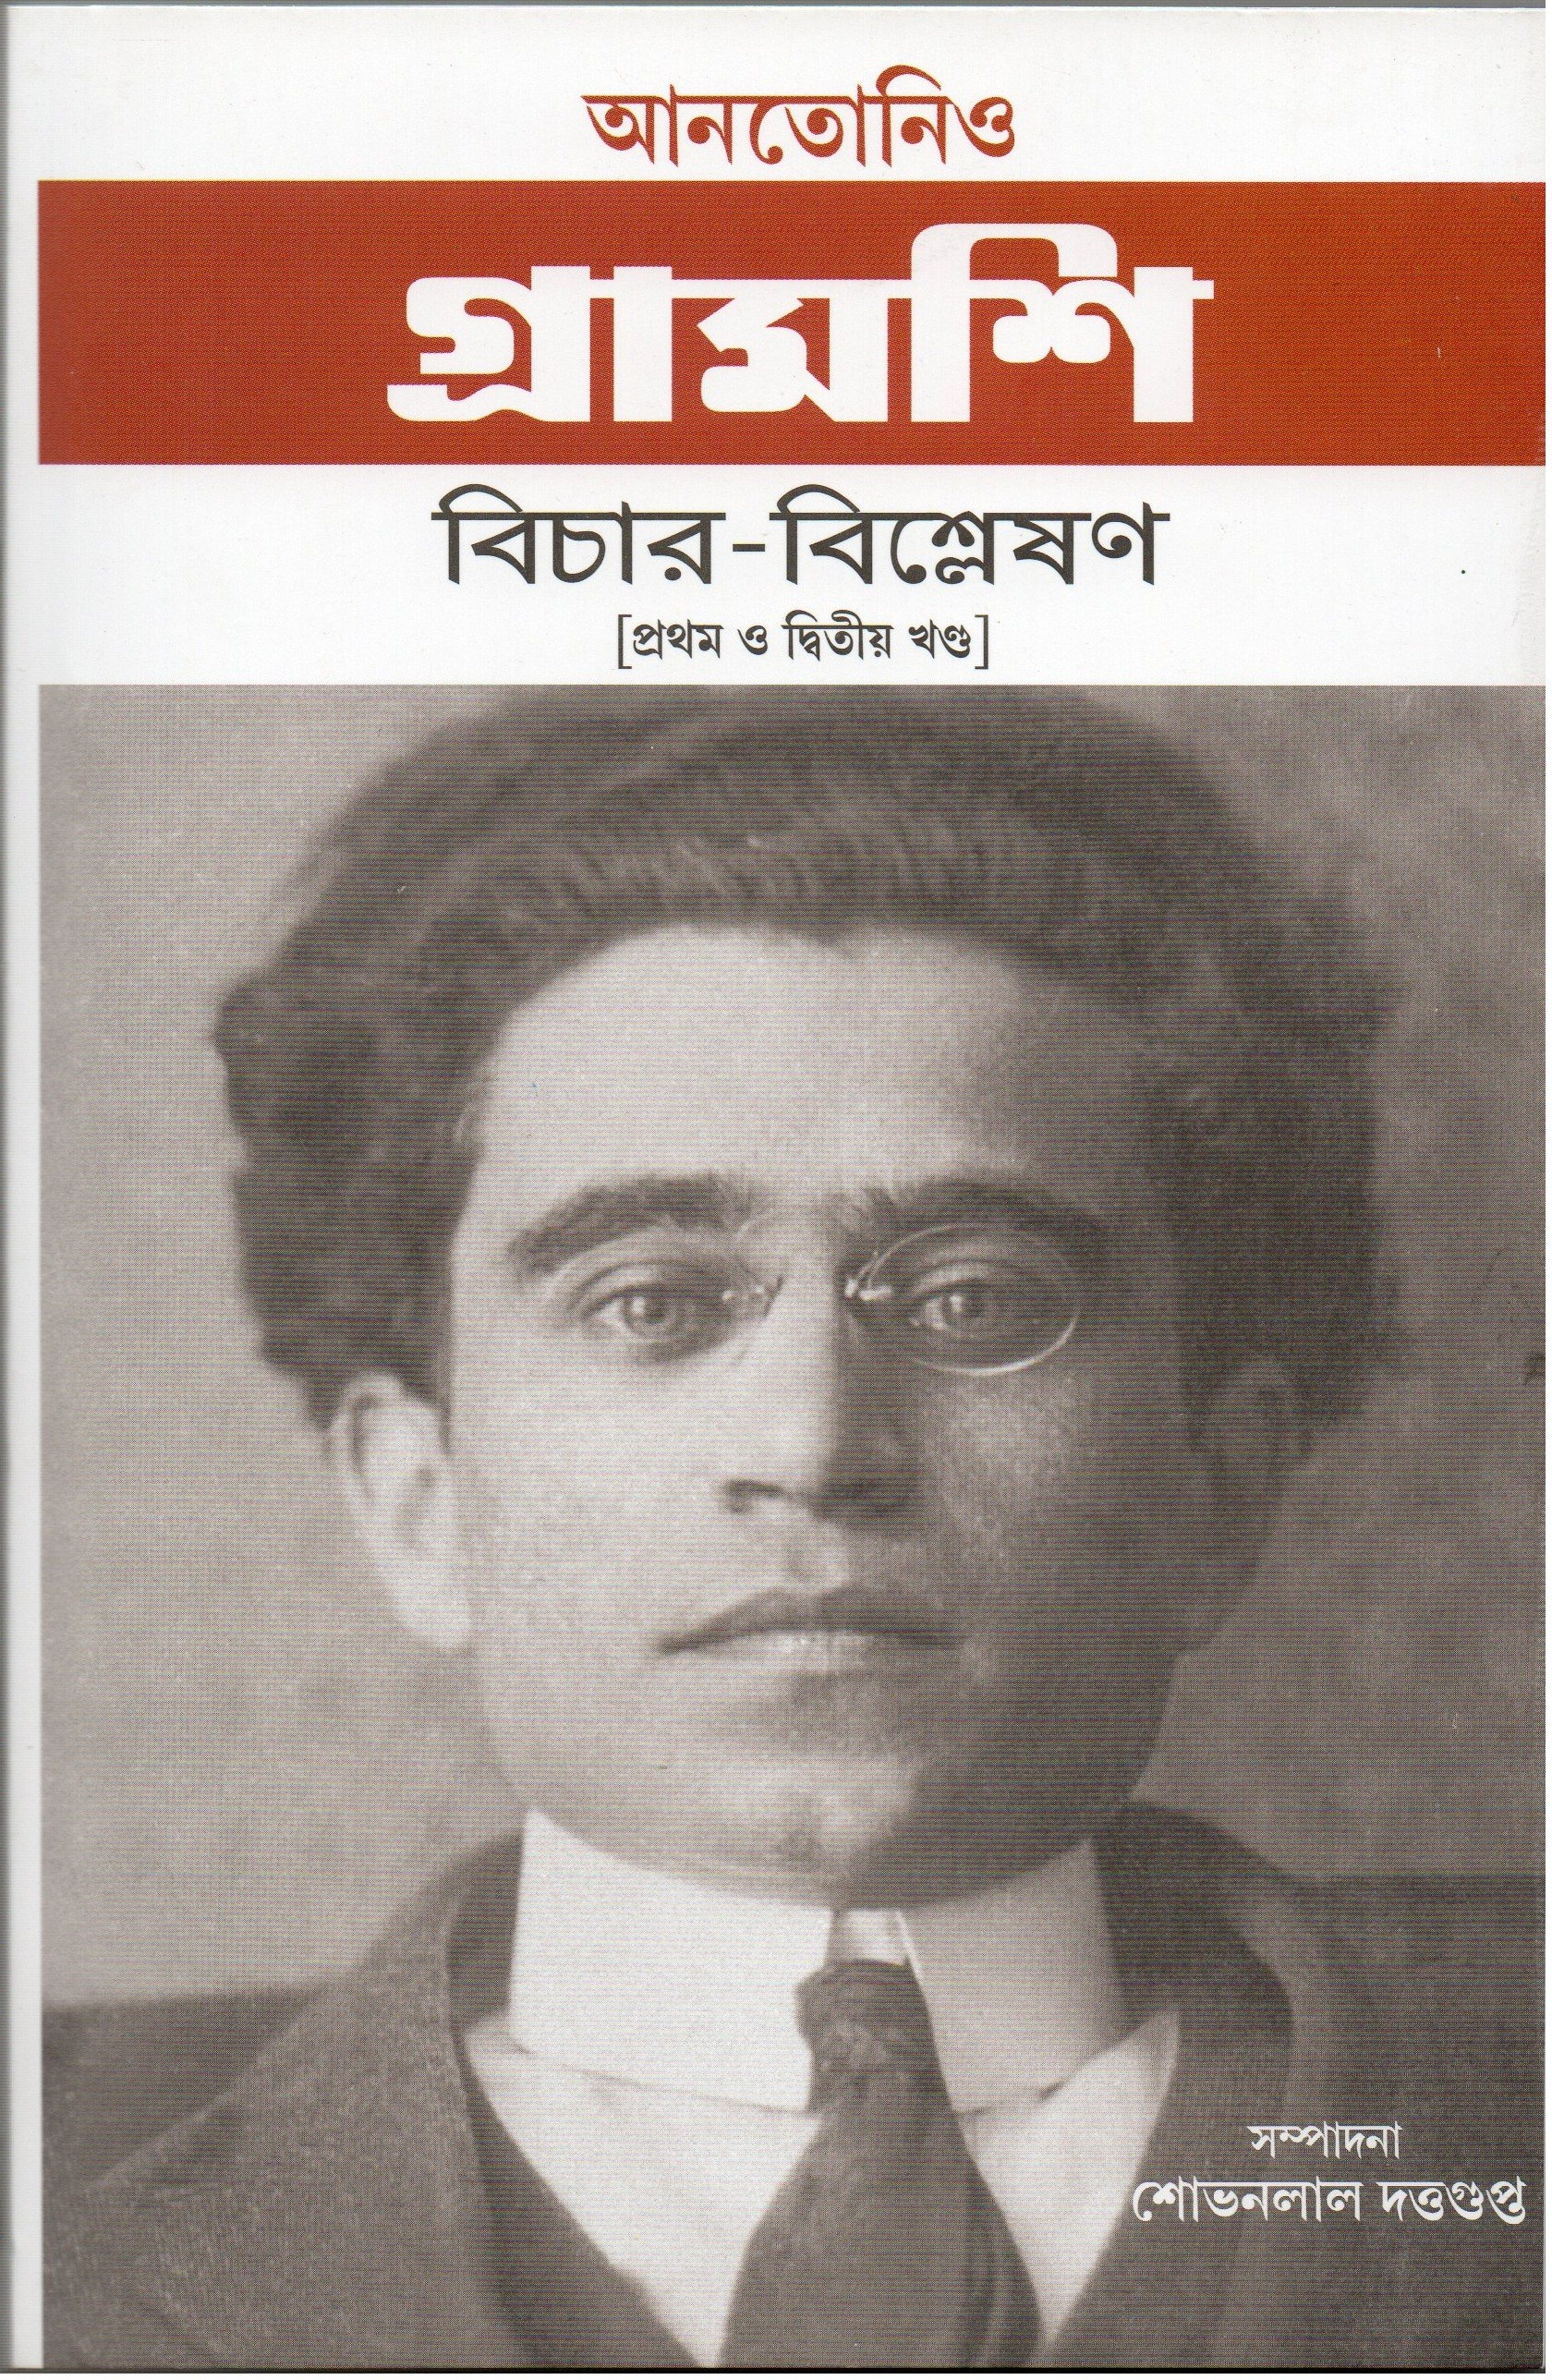 Antonio Gramsci-Bichar-Bishleshan (Vol-I and II)